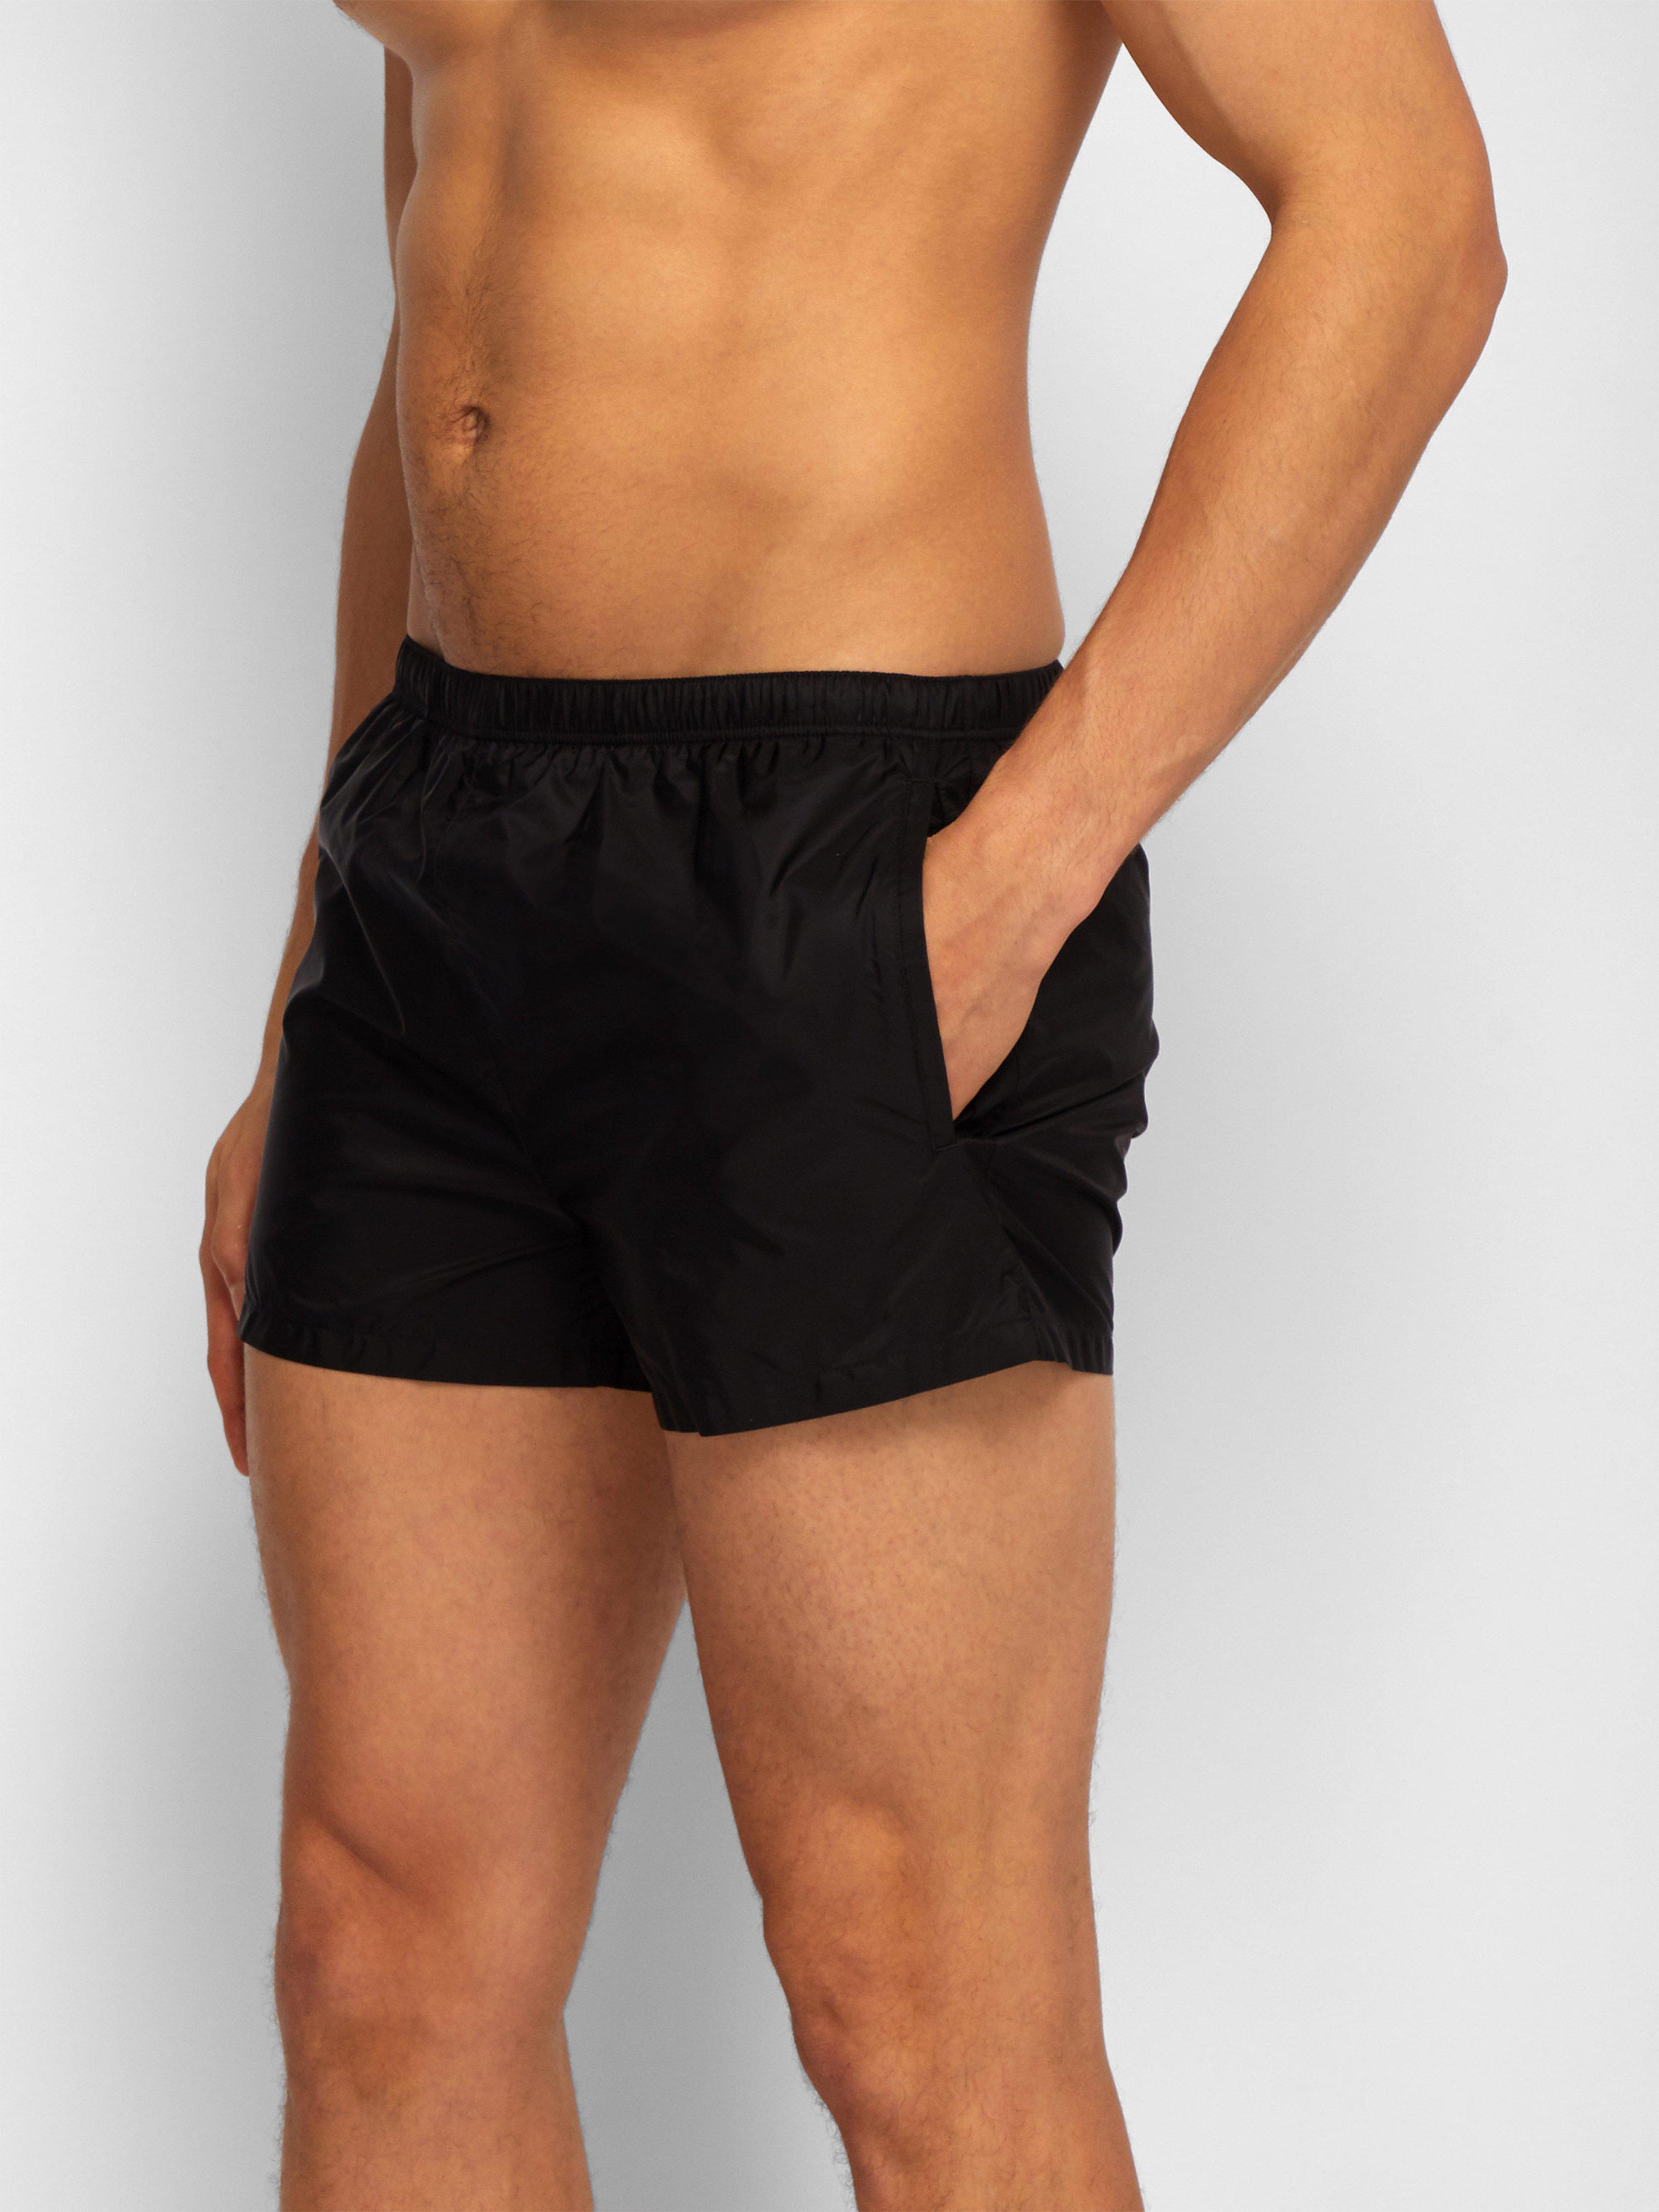 223dce1b3b Prada Elasticated Waist Nylon Swim Shorts in Black for Men - Lyst